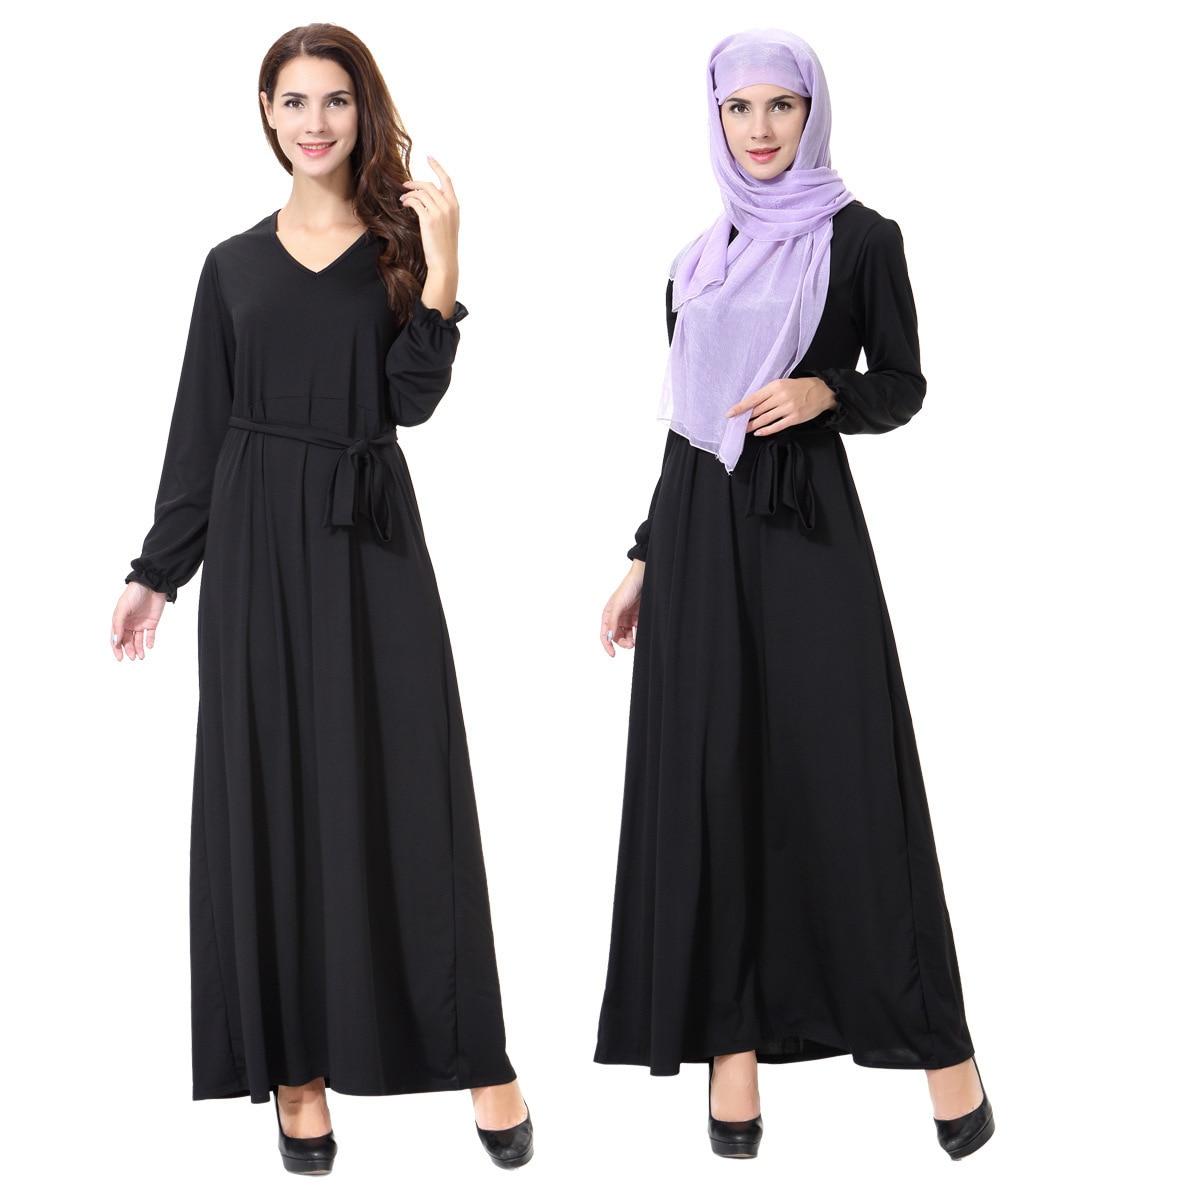 Islamic Muslim Ladies Thobe Malaysia Long Sleeve Abaya Muslim Women's Abaya